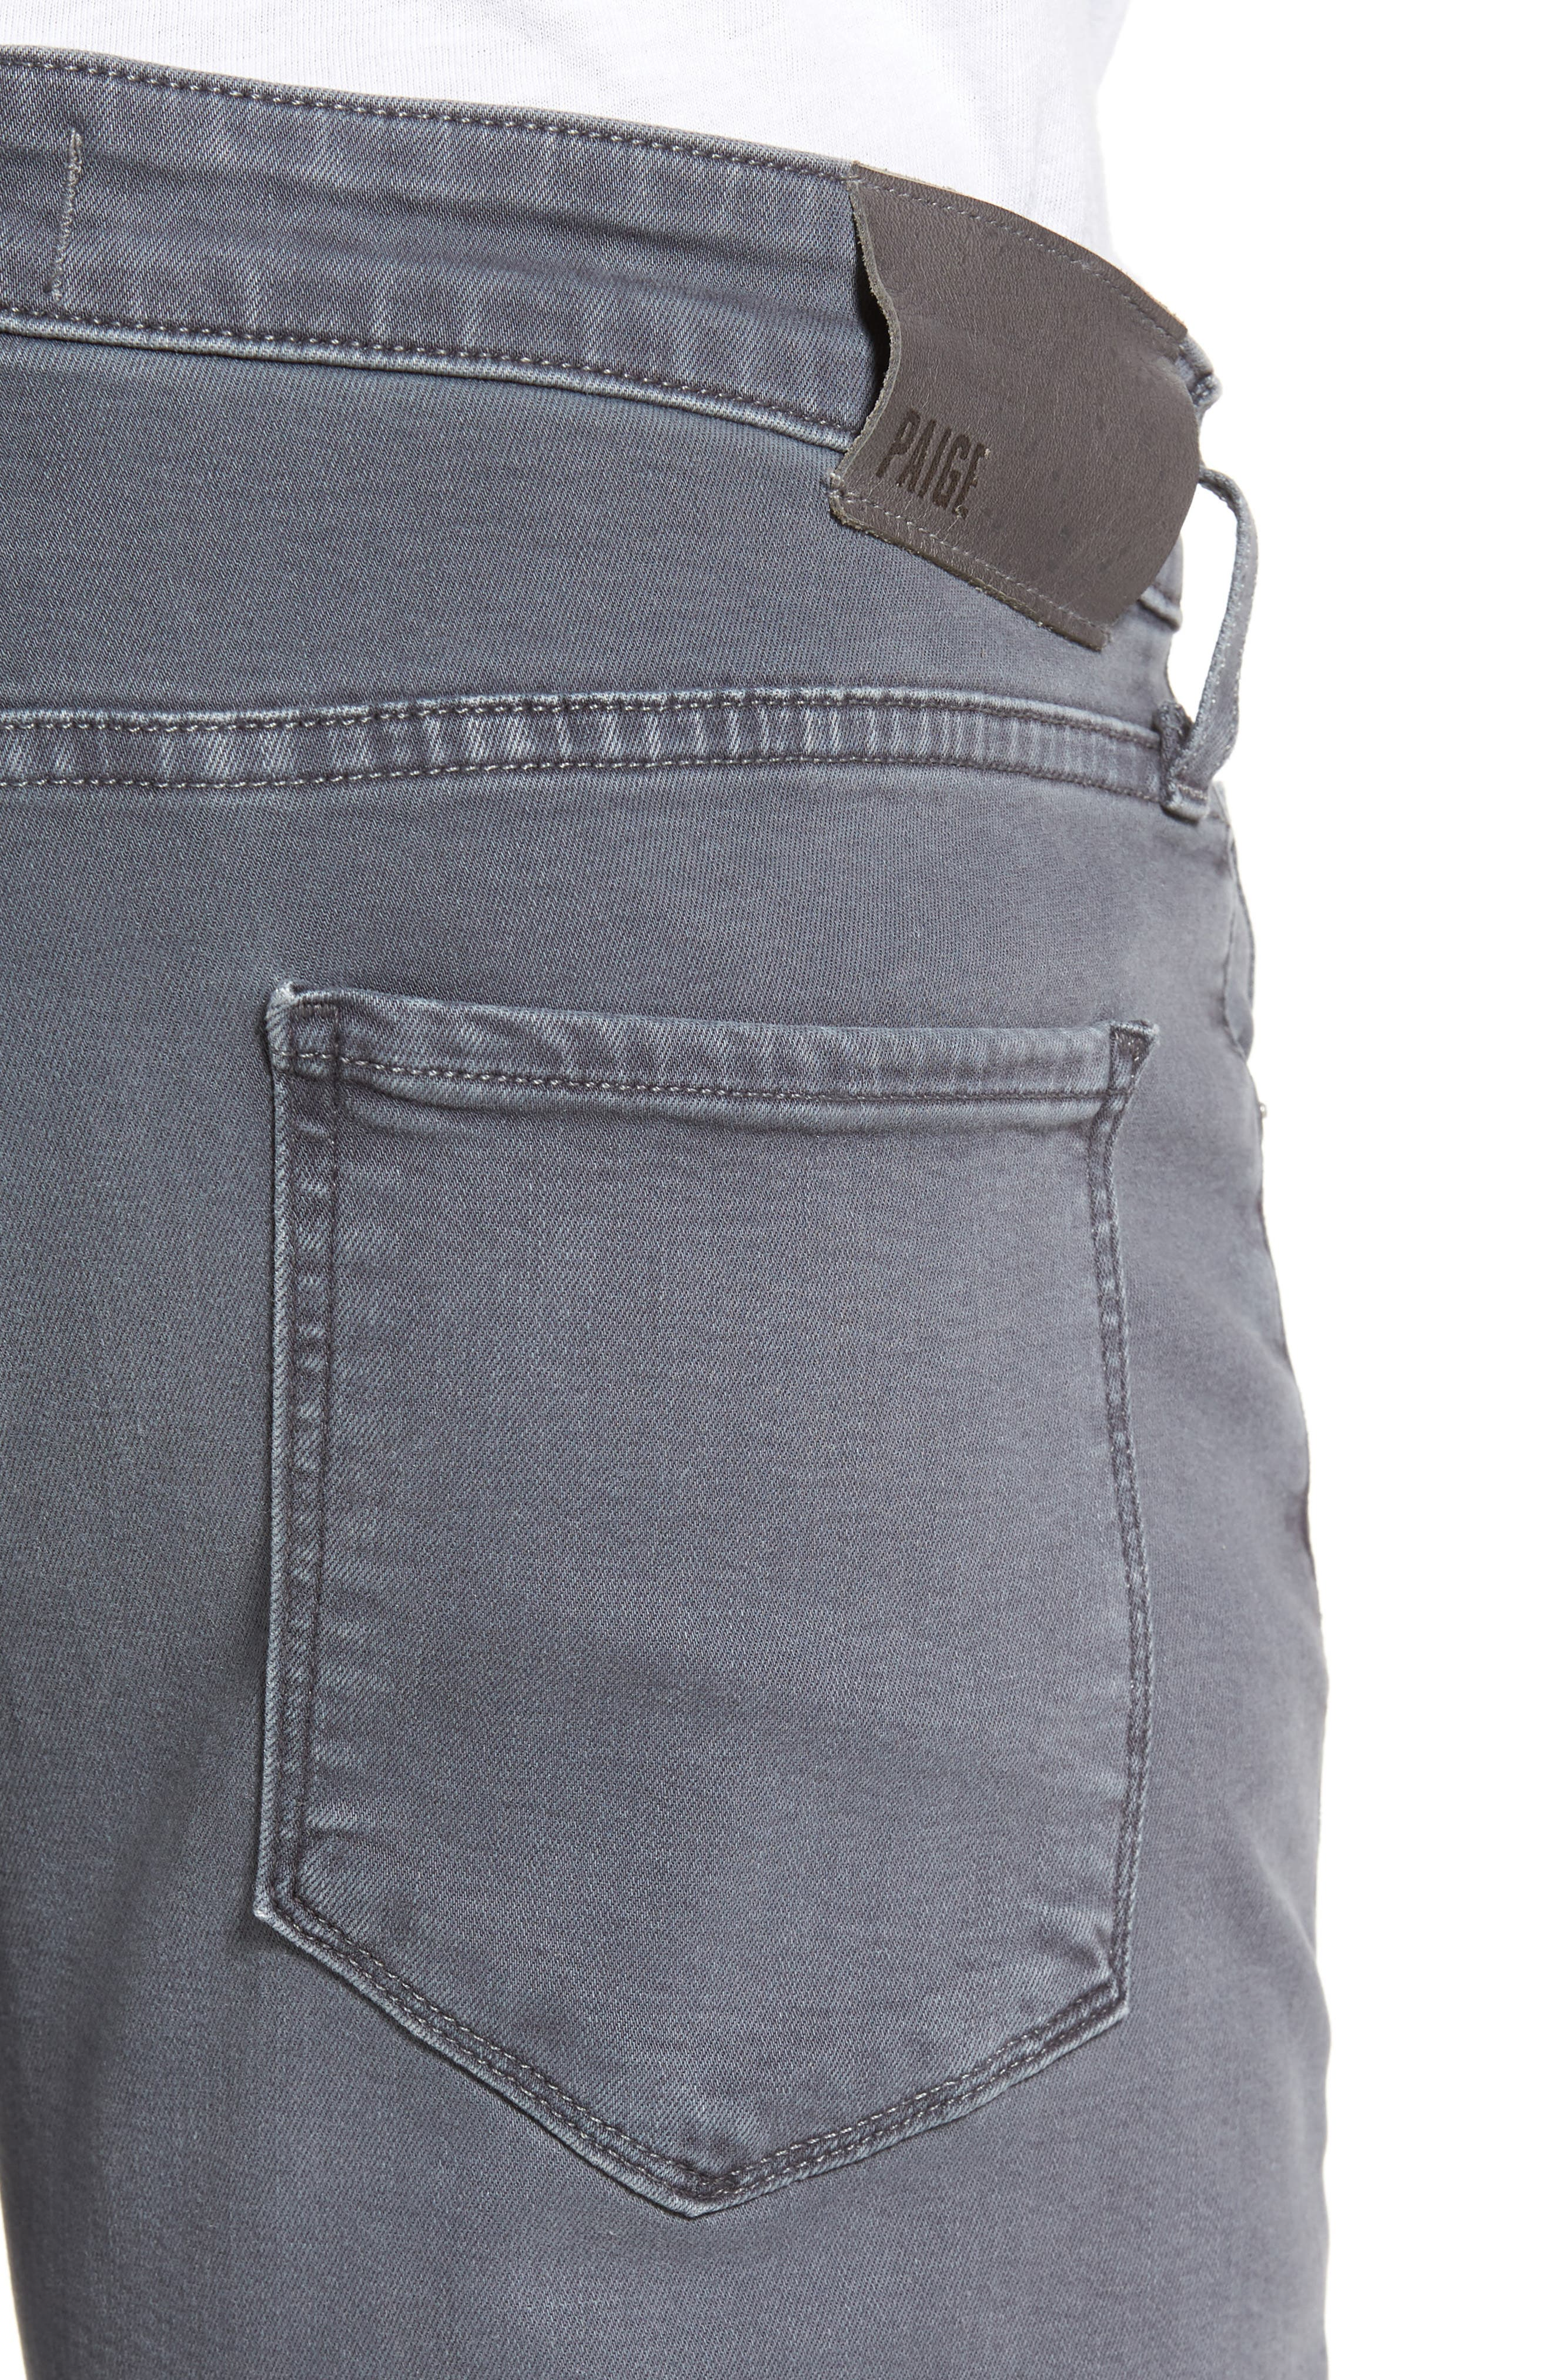 Lennox Slim Fit Jeans,                             Alternate thumbnail 4, color,